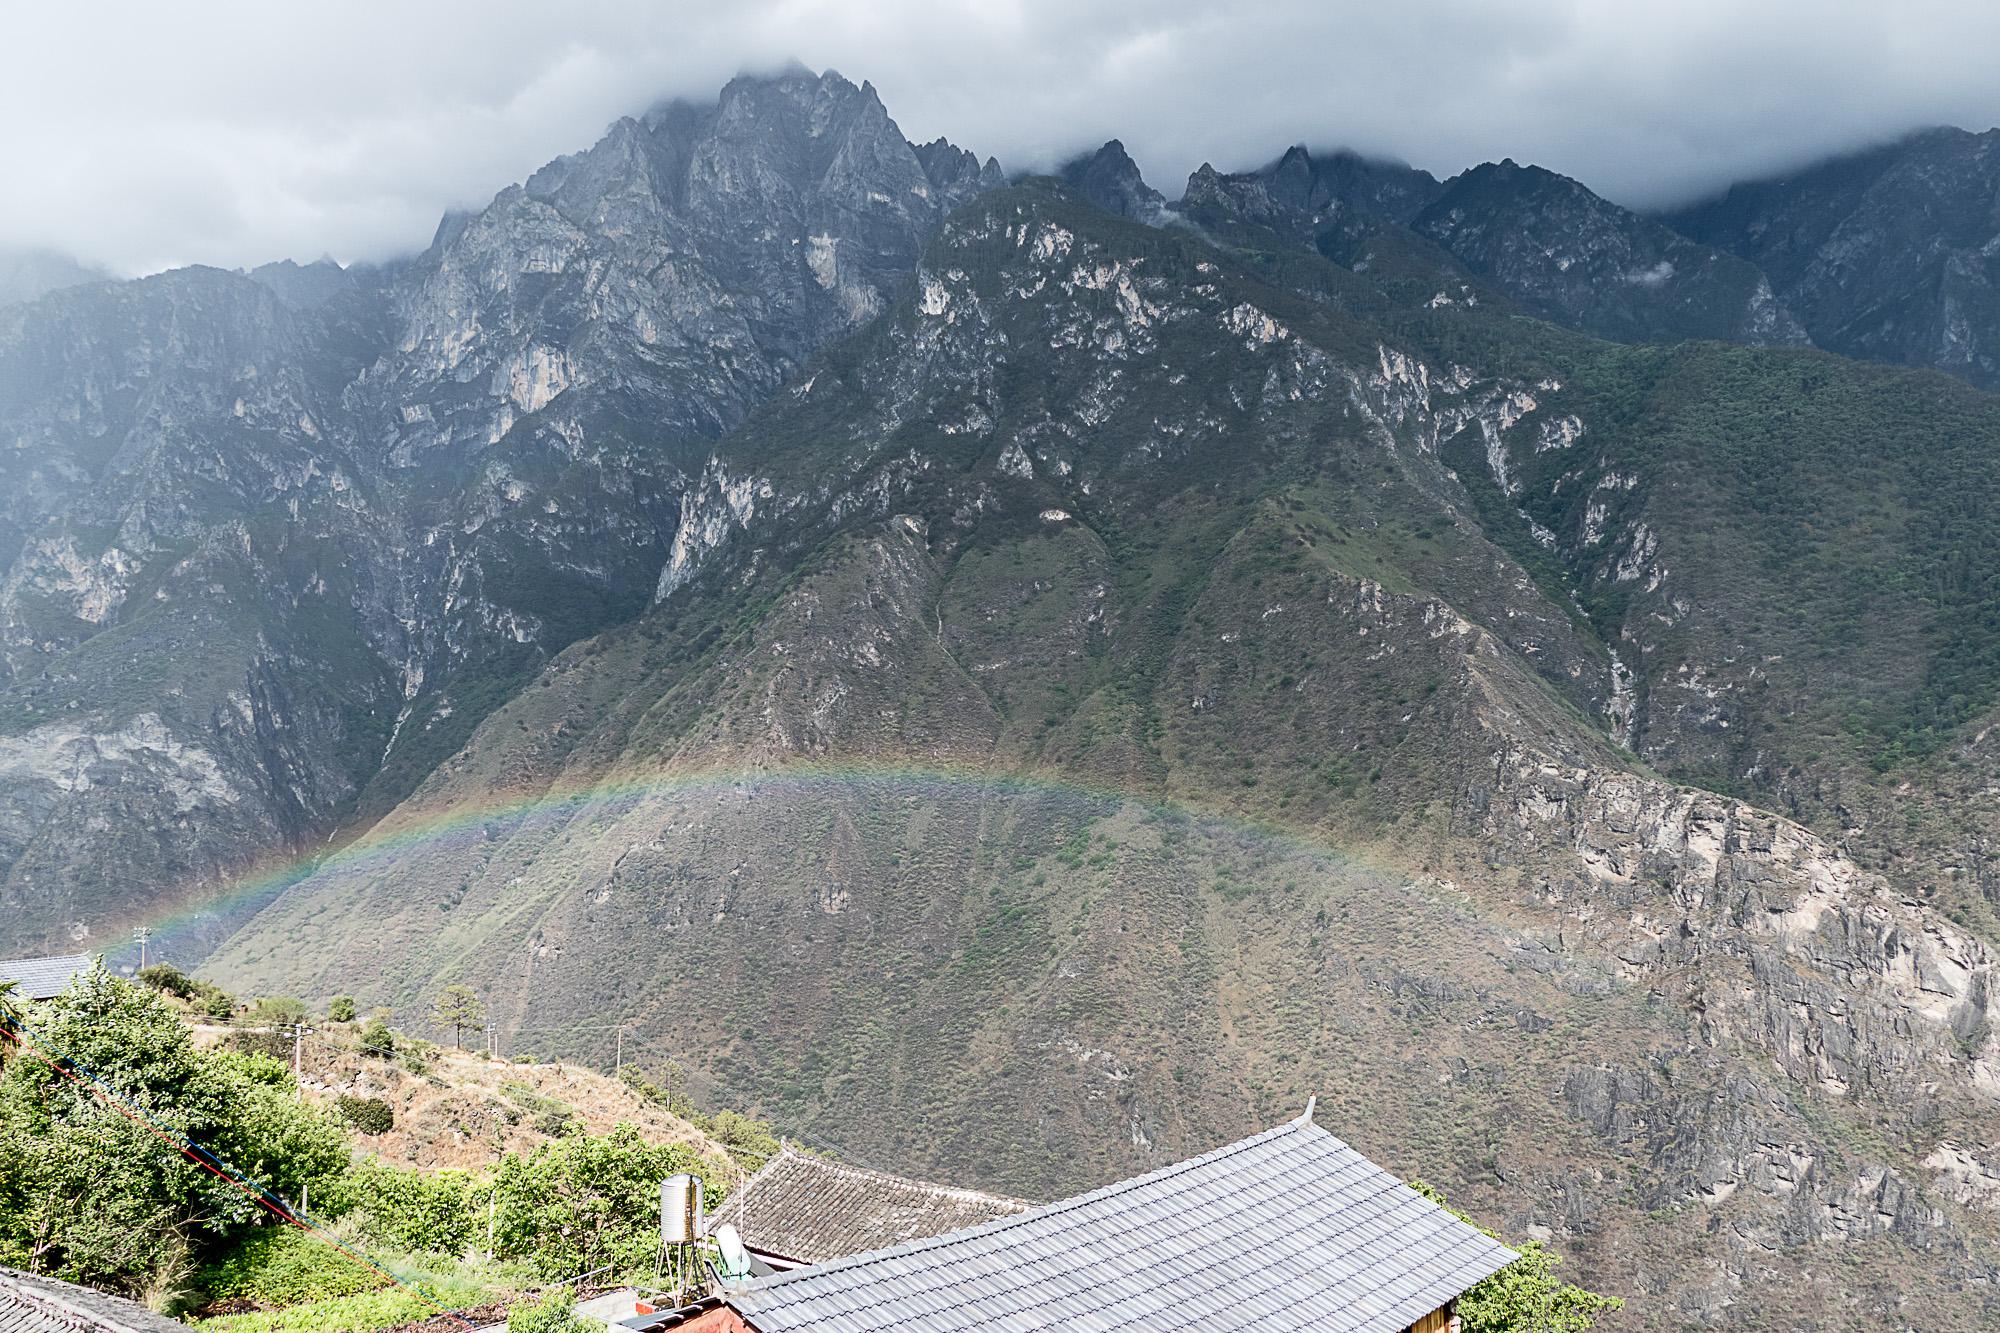 Rainbow over the gorge